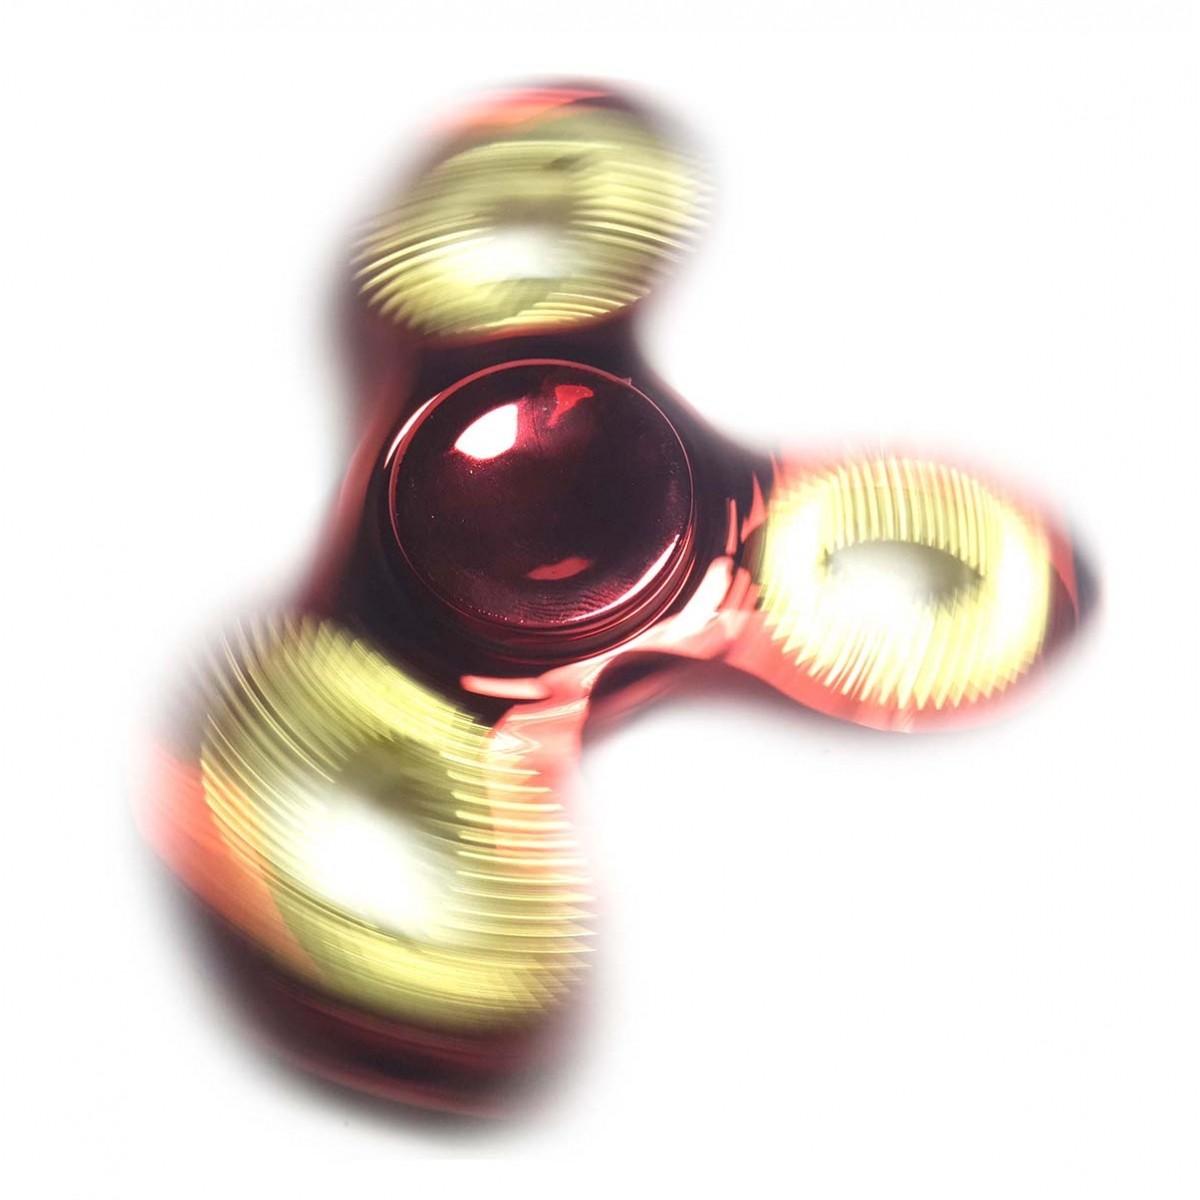 Hand Spinner Fidget de Metal Ansiedade Anti Estresse Giro Cromado Vermelho (bsl-gira-1-metal)